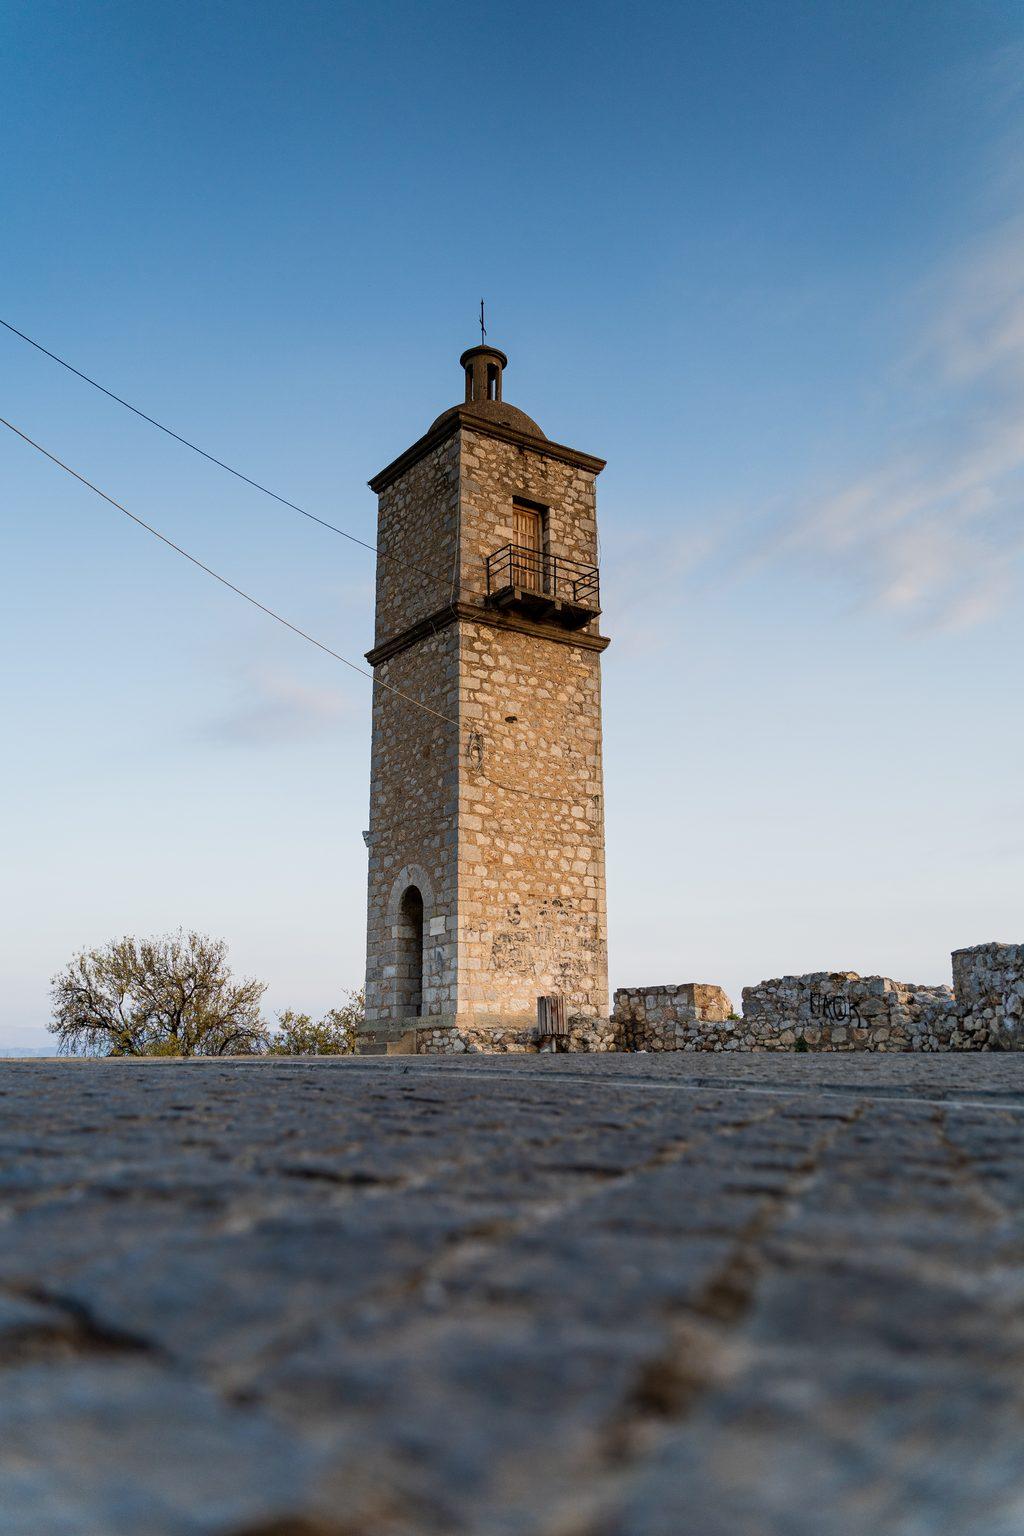 Kirchenturm in Nafplion am Peloponnes.